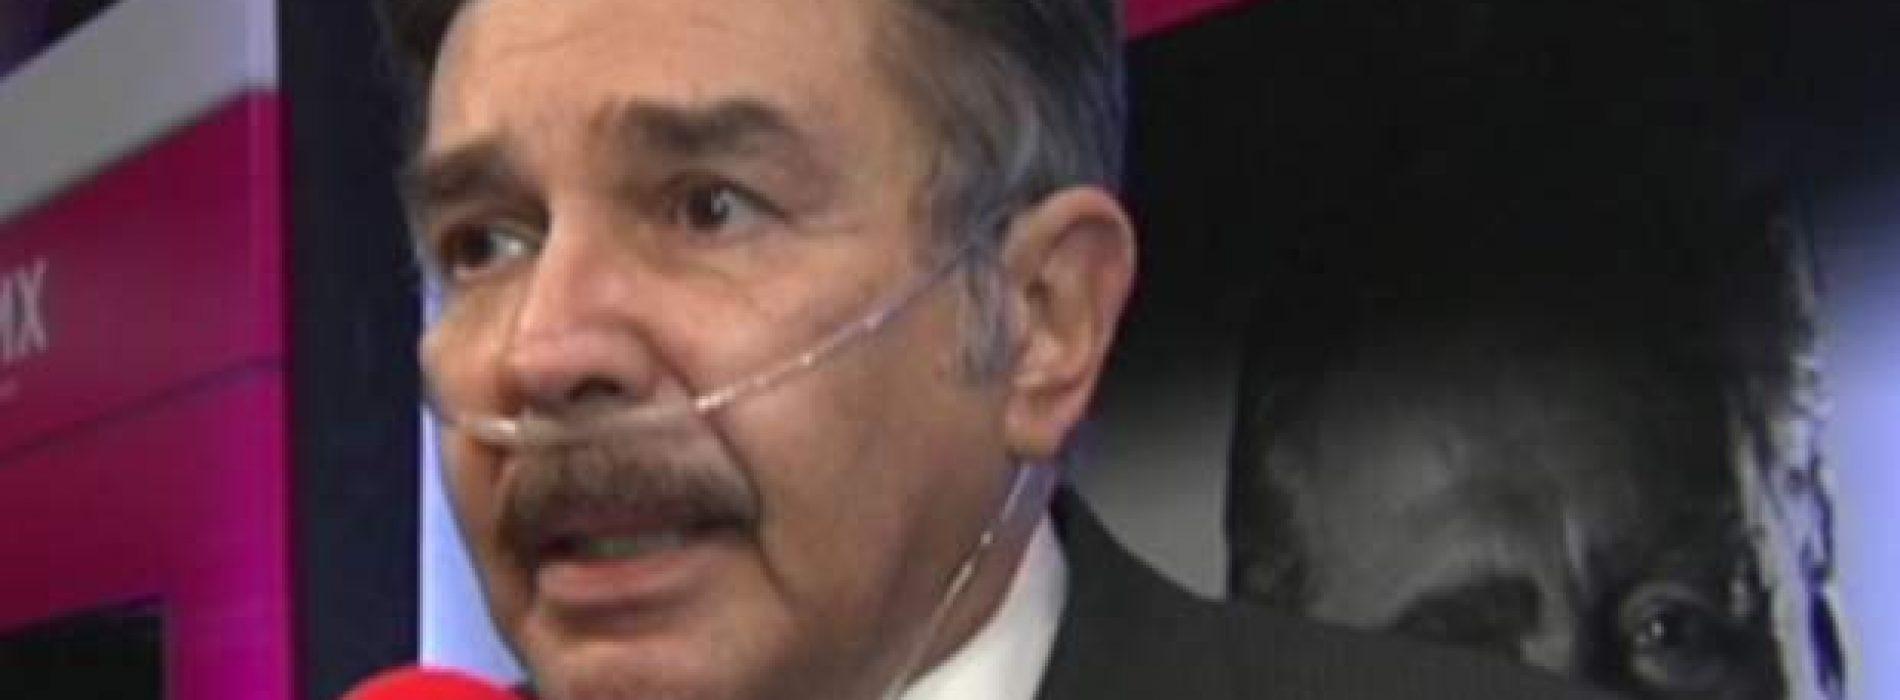 Jorge Ortiz de Pinedo está hospitalizado con neumonía